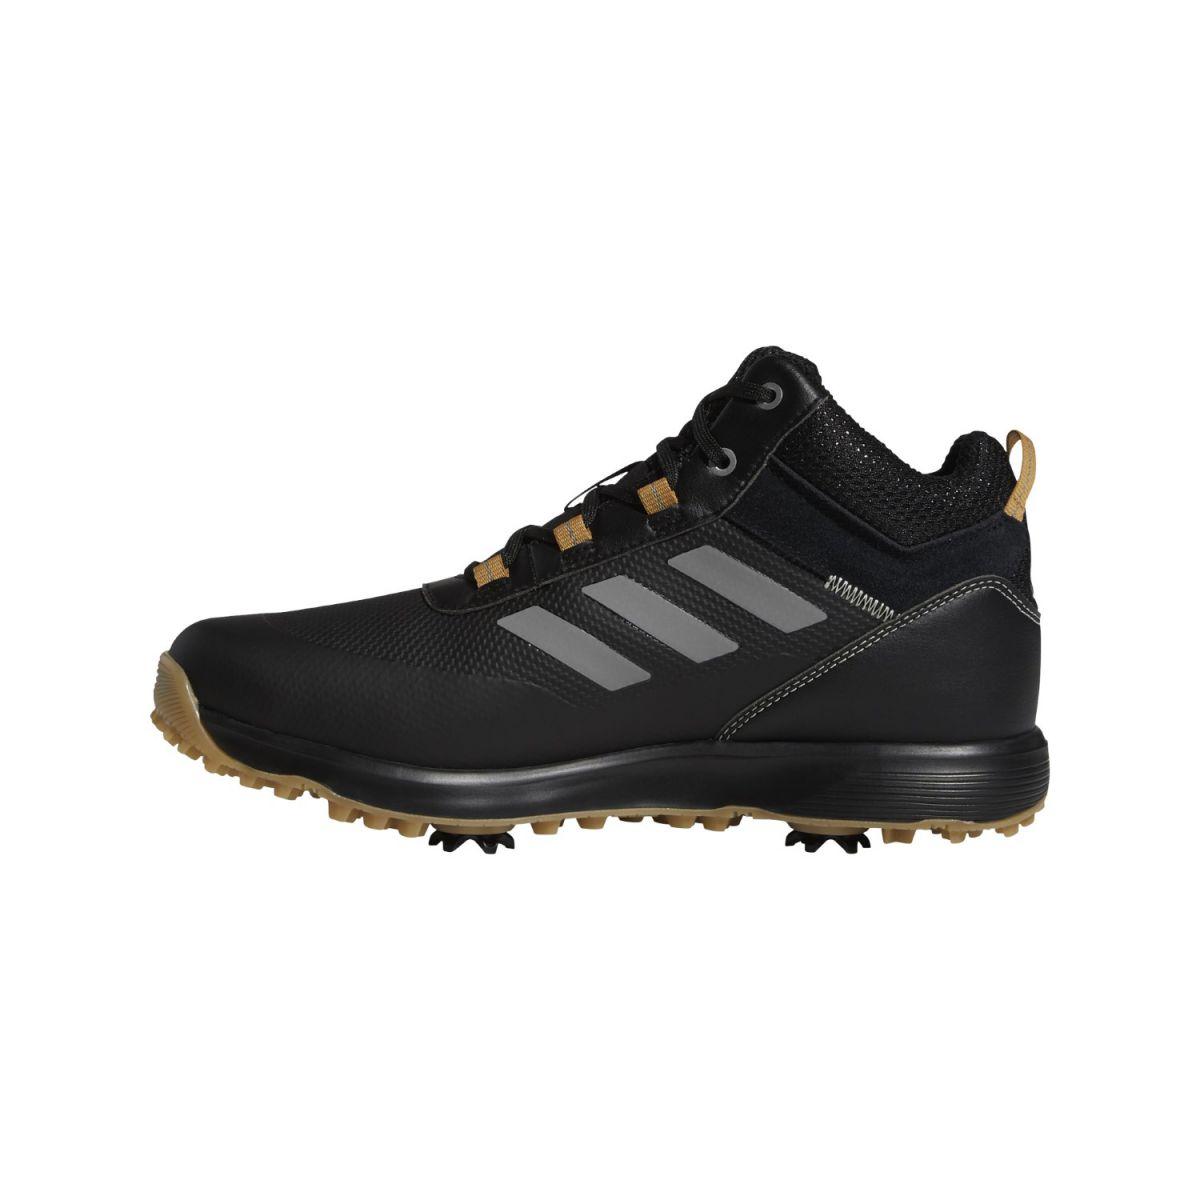 adidas boot s2g mid black 42